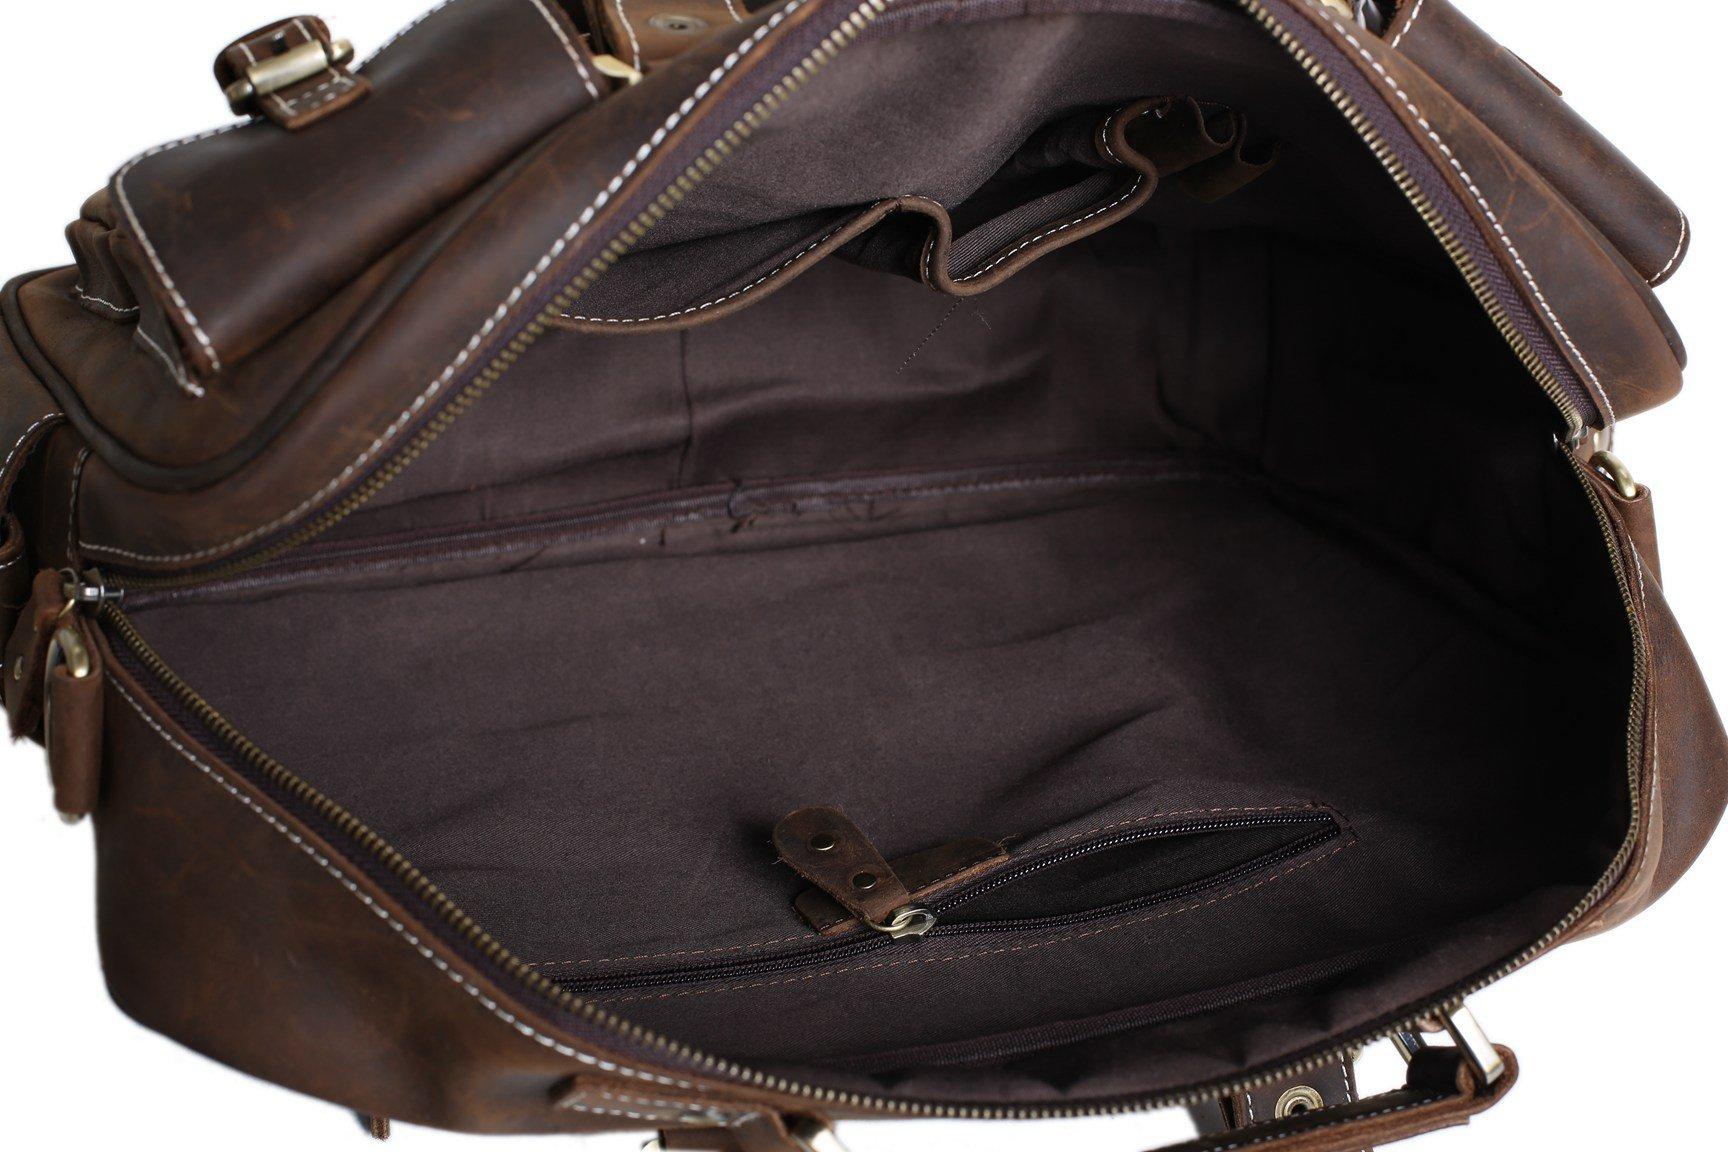 ea92b37e6dc58 Handcrafted Vintage Extra Large Genuine Leather Travel Bag Duffle Bag  Organizer Bag 7028